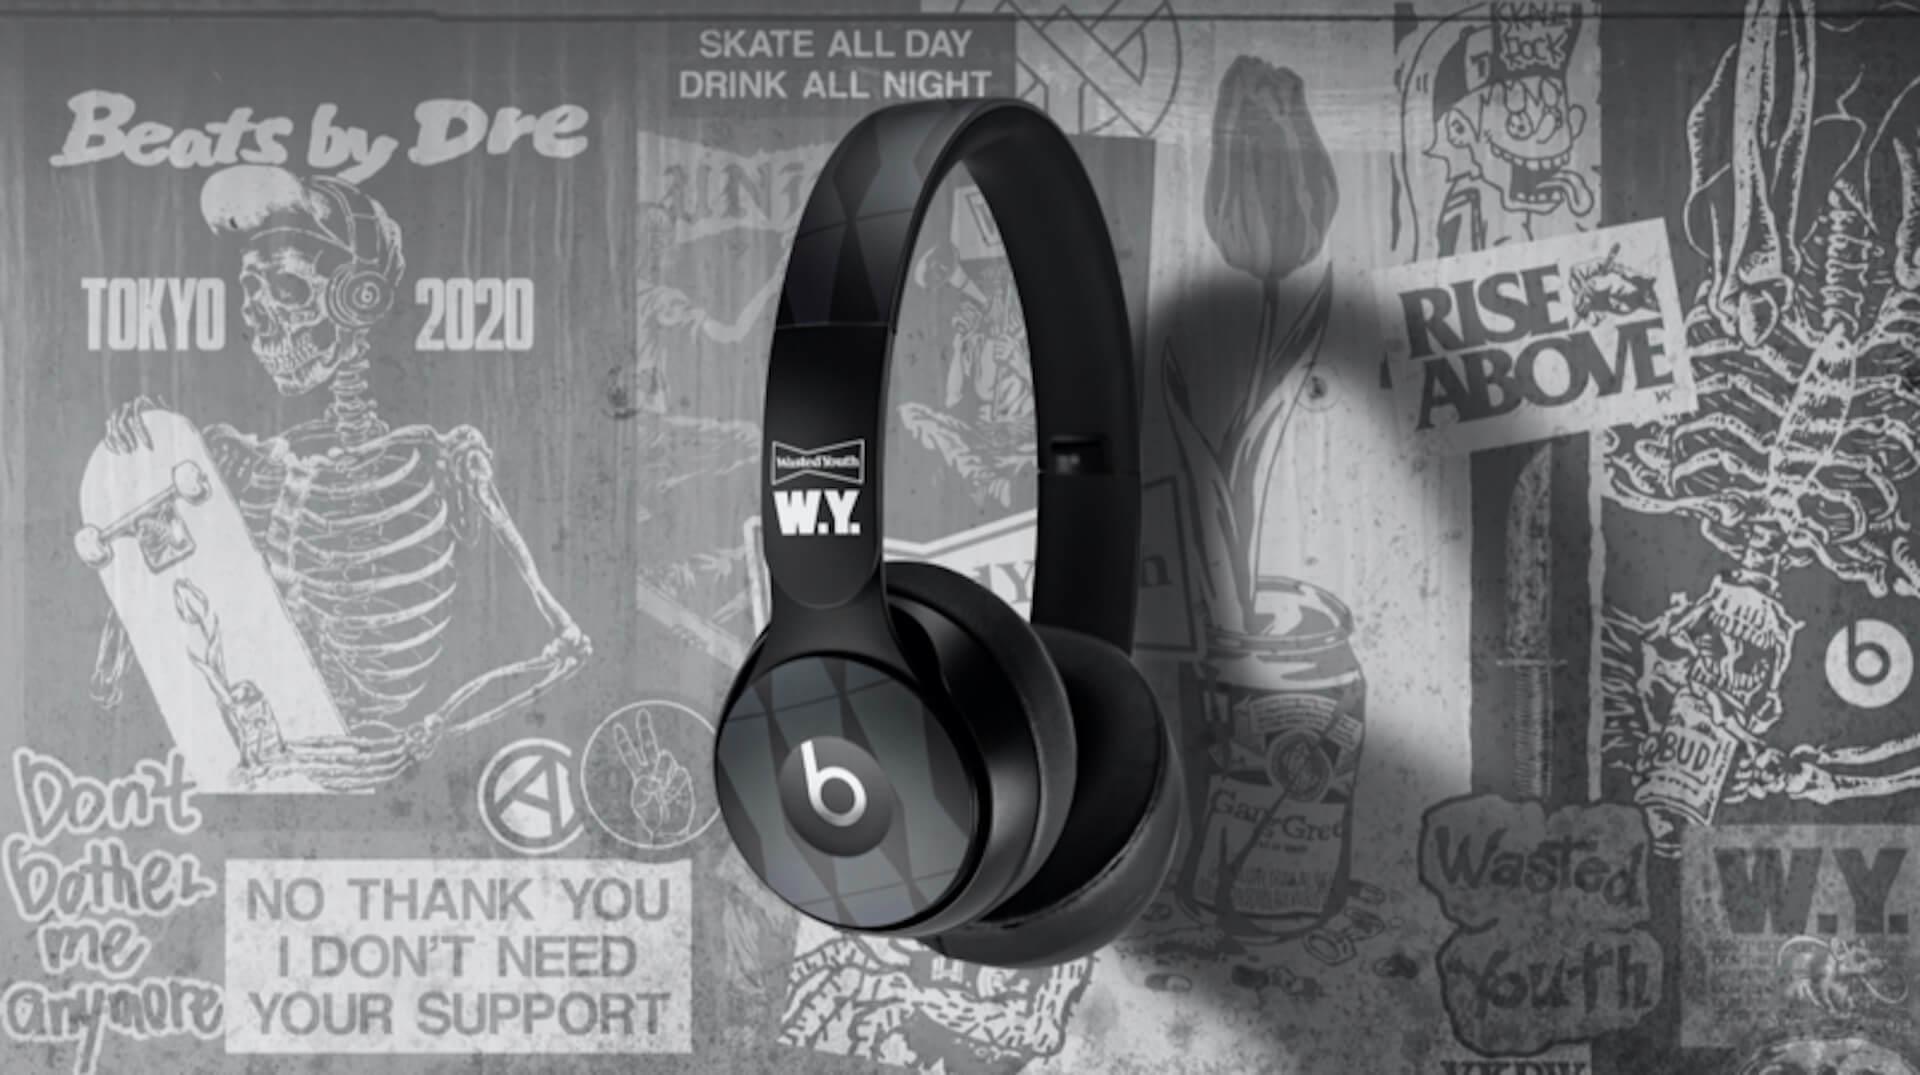 BeatsとWasted Youthのコラボレーションによる『Solo Pro』が発売決定!VERDYがデザインを担当したカプセルコレクションが登場 music201215_beats_wastedyouth_1